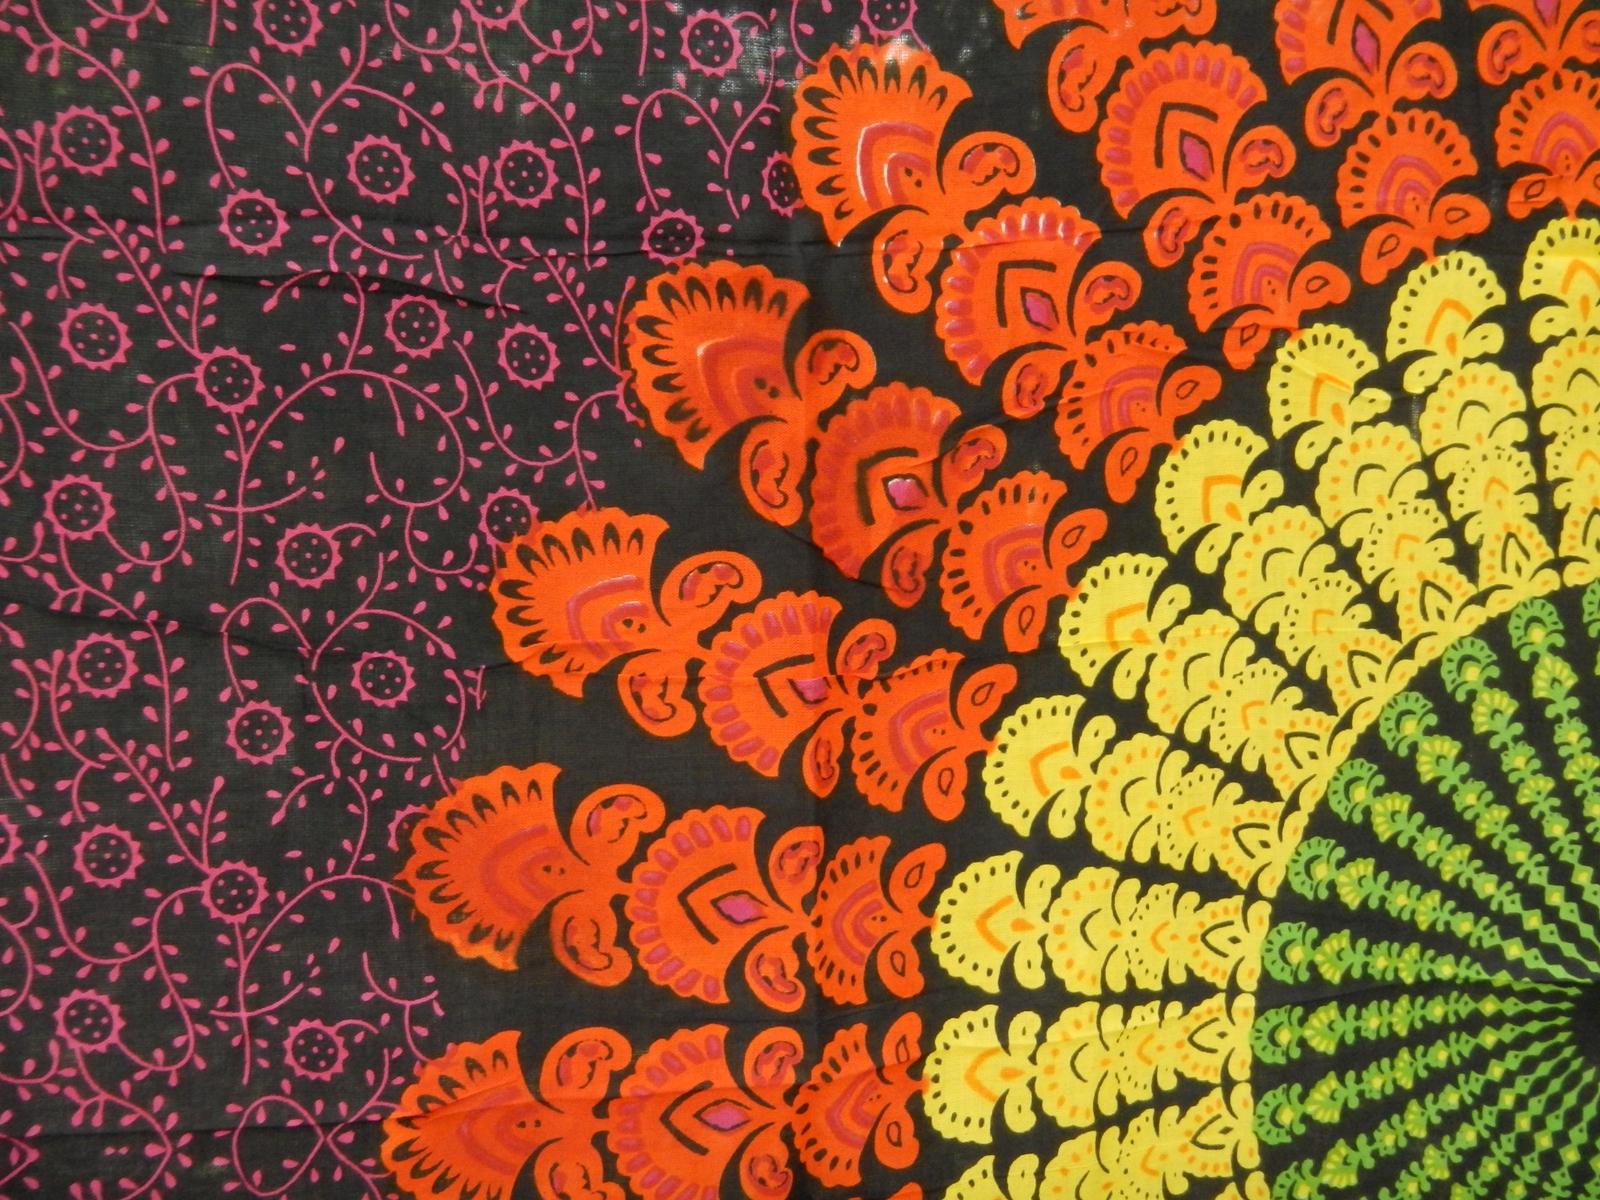 Iphone wallpaper tumblr boho - Bohemian Mandala Neon Black